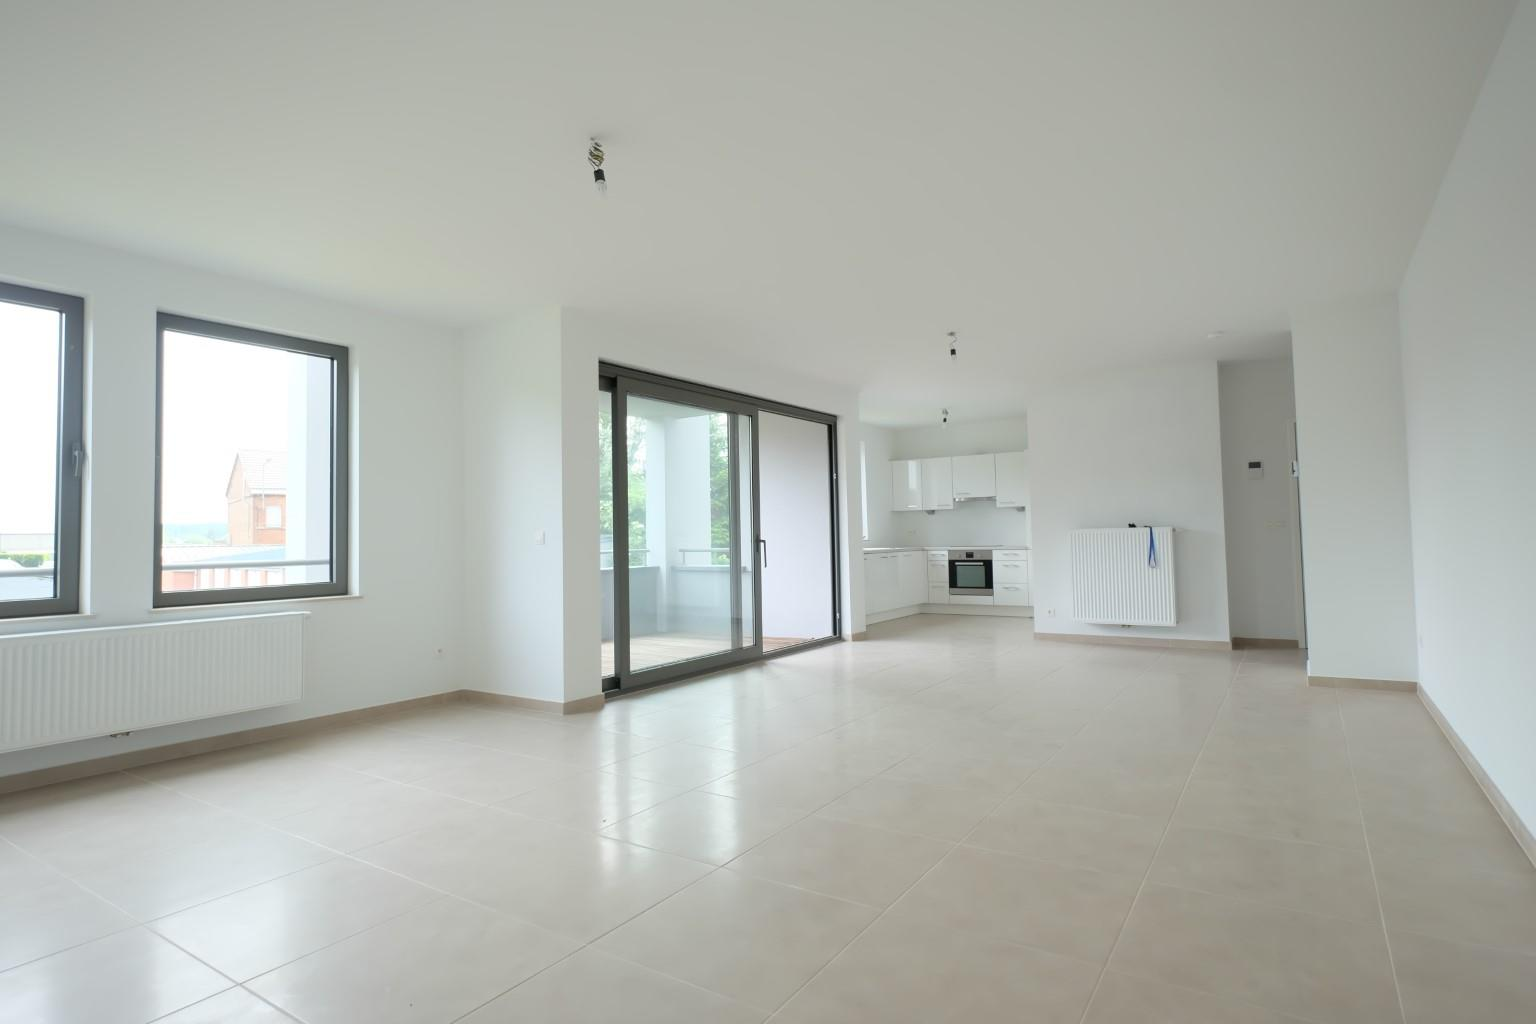 Appartement - Soignies - #3015957-13